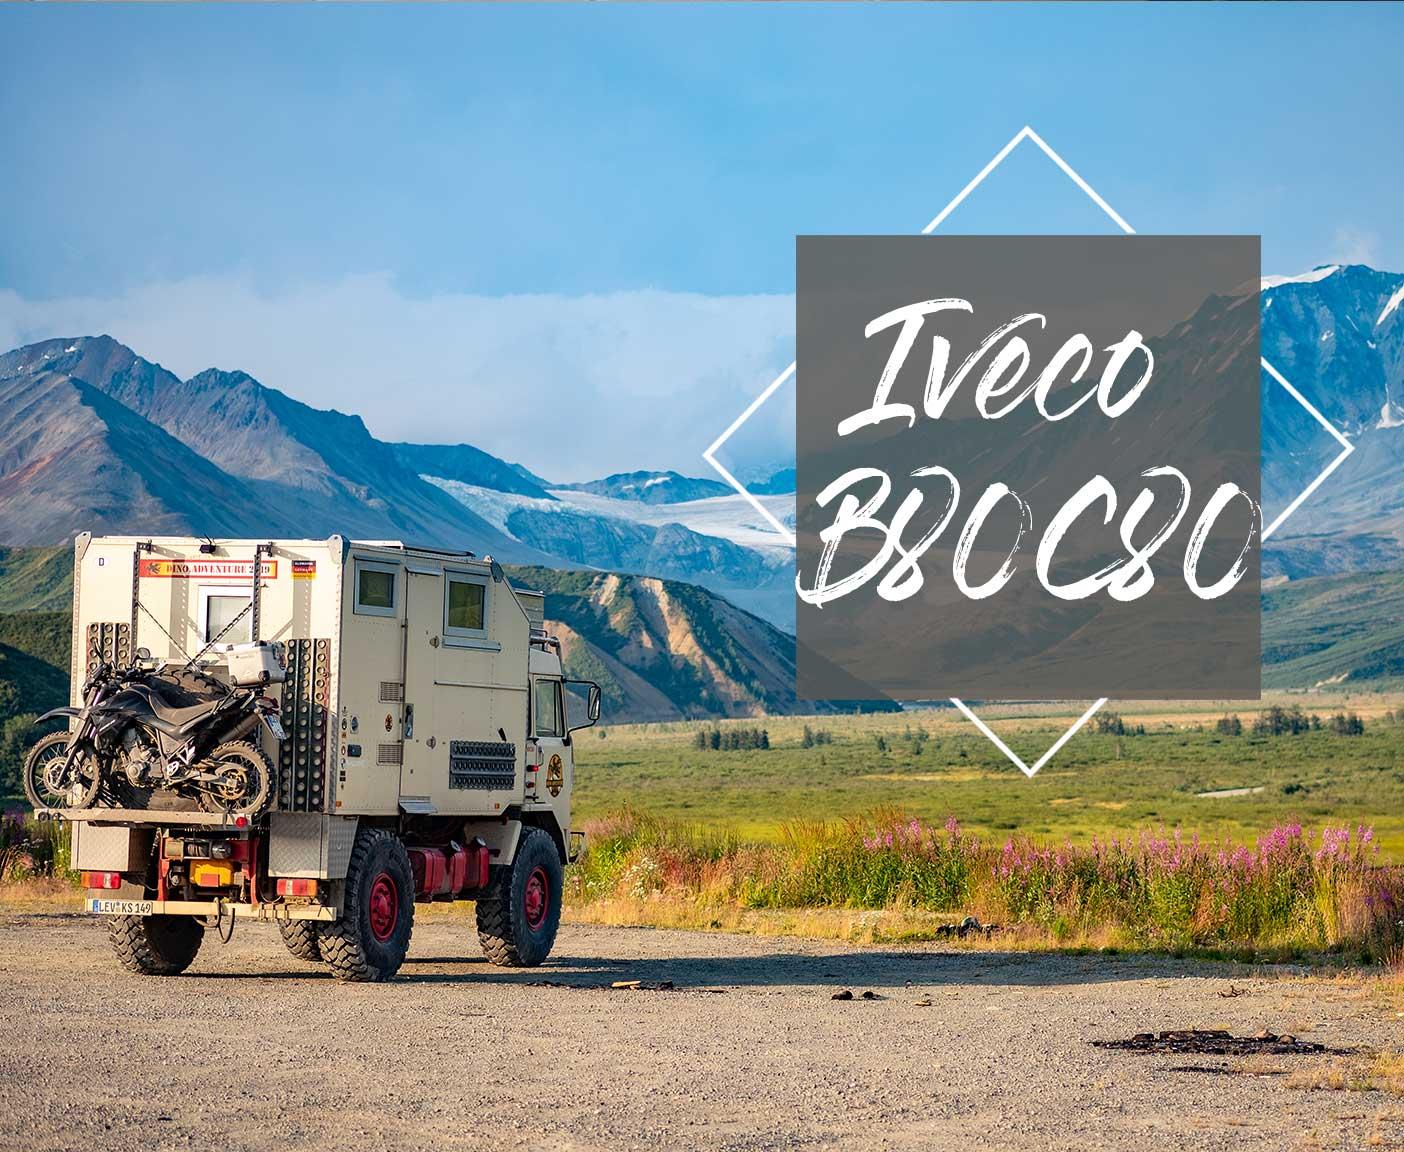 Iveco B80C80 wohnmobil expeditionsmobil reisen abenteuer